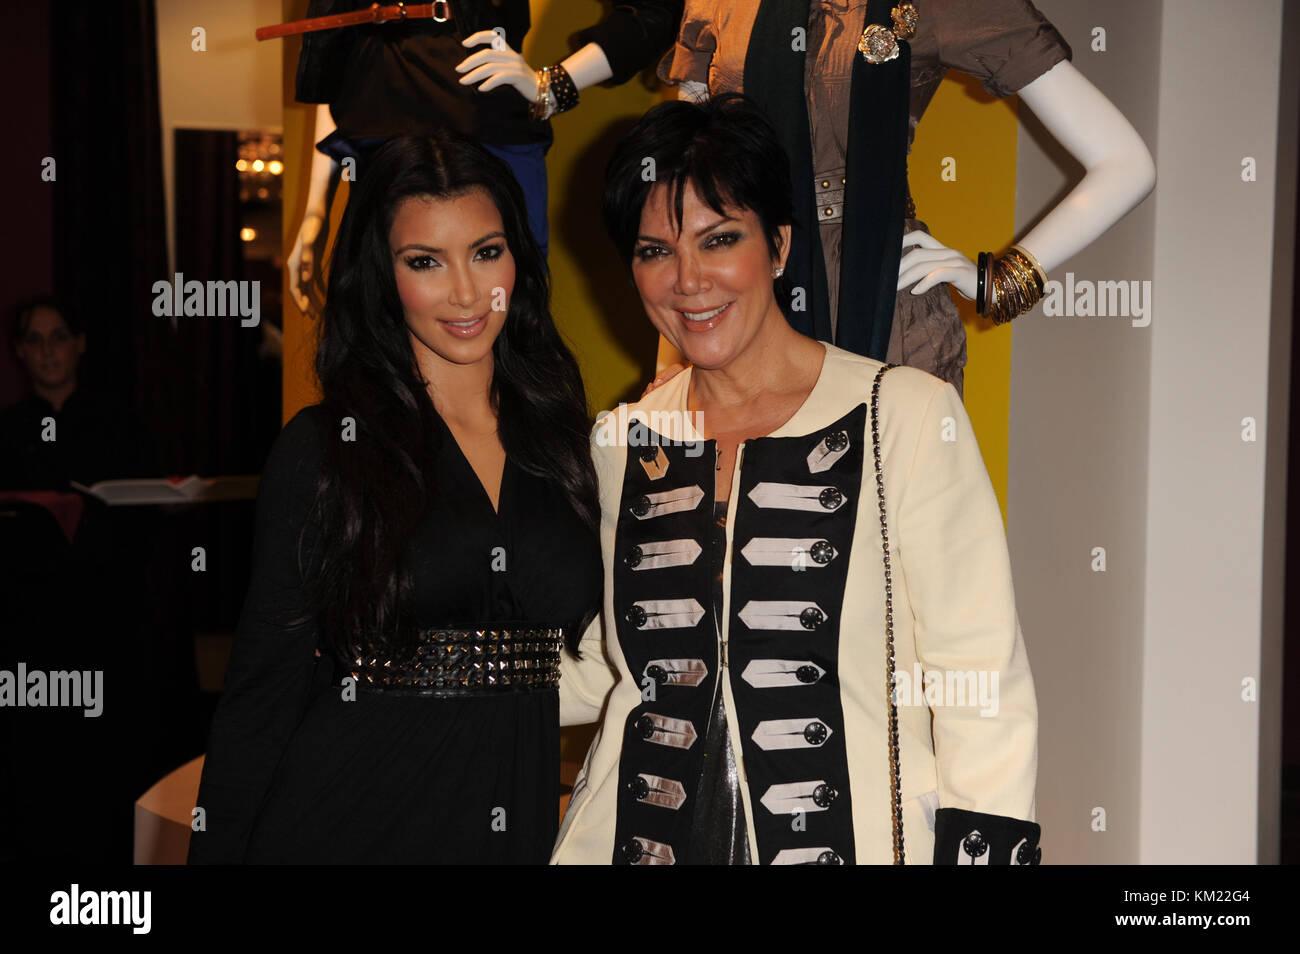 SMG_Kim Kardashian_Agaci_112009_06.jpg  SUNRISE- NOVEMBER 20: Media and reality show personality Kim Kardashian - Stock Image